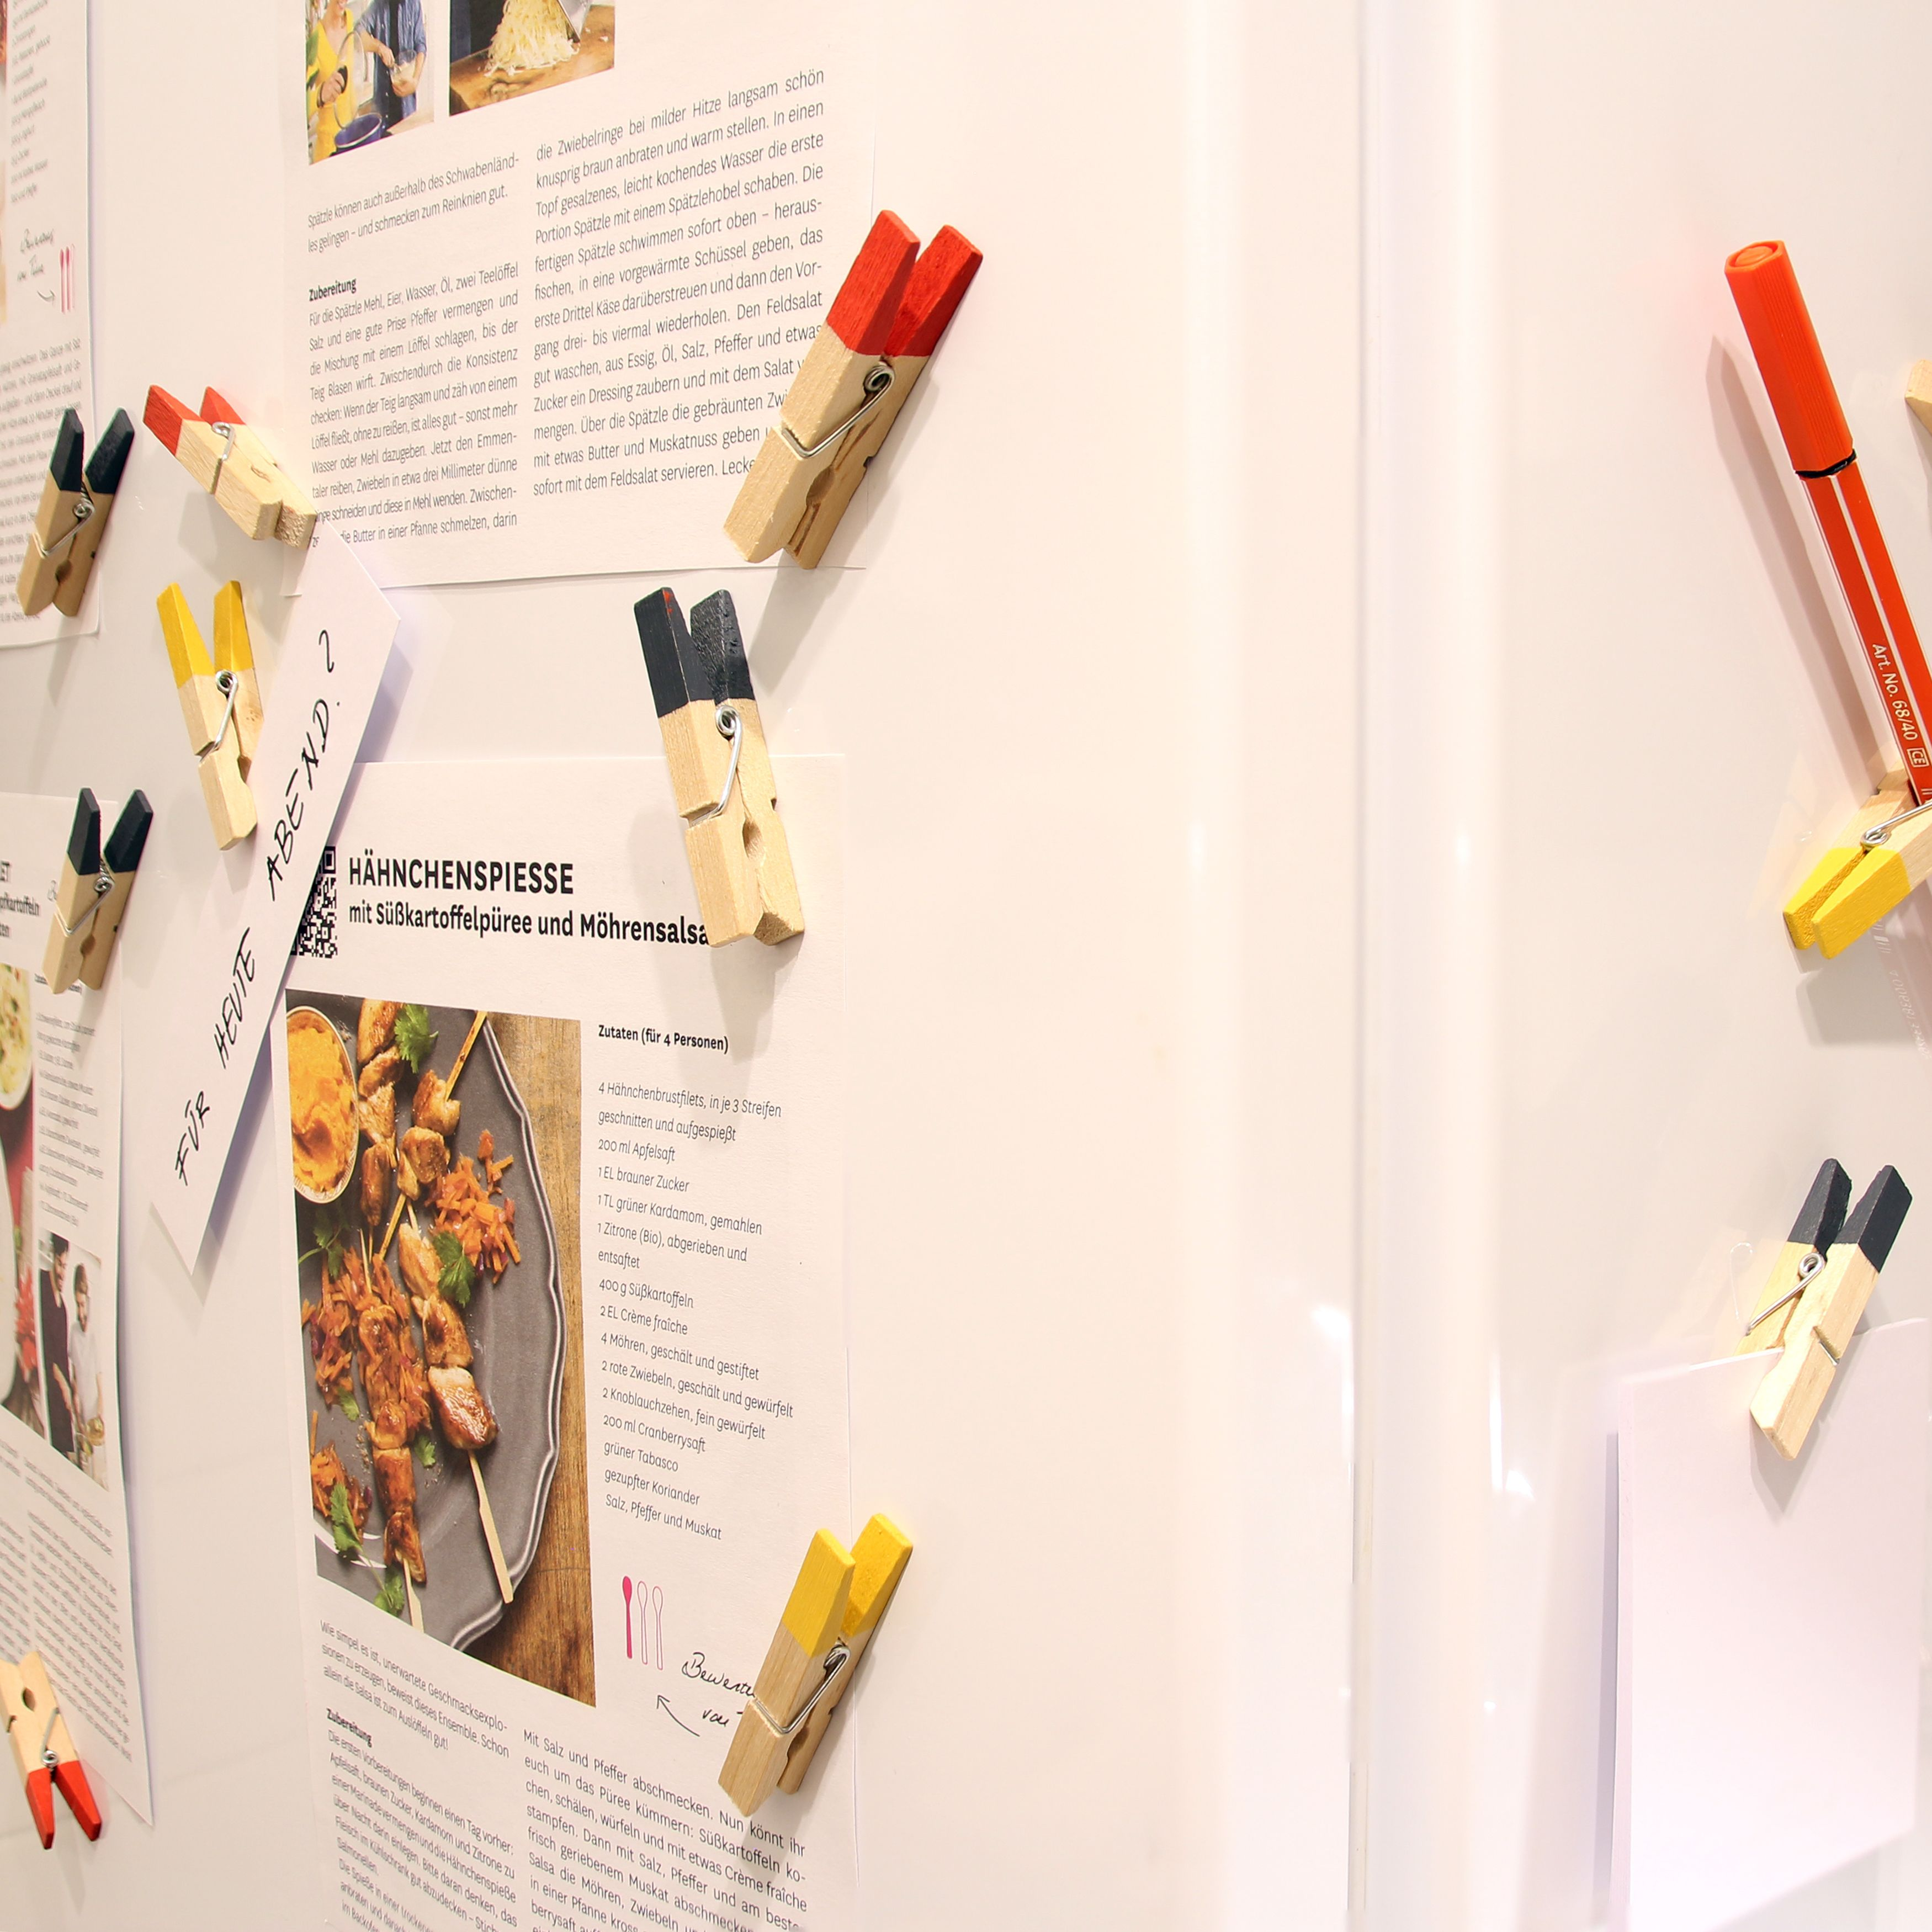 k hlschrank deko holzklammern magneten rot gelb schwarz k hlschrank dekoration pinterest. Black Bedroom Furniture Sets. Home Design Ideas